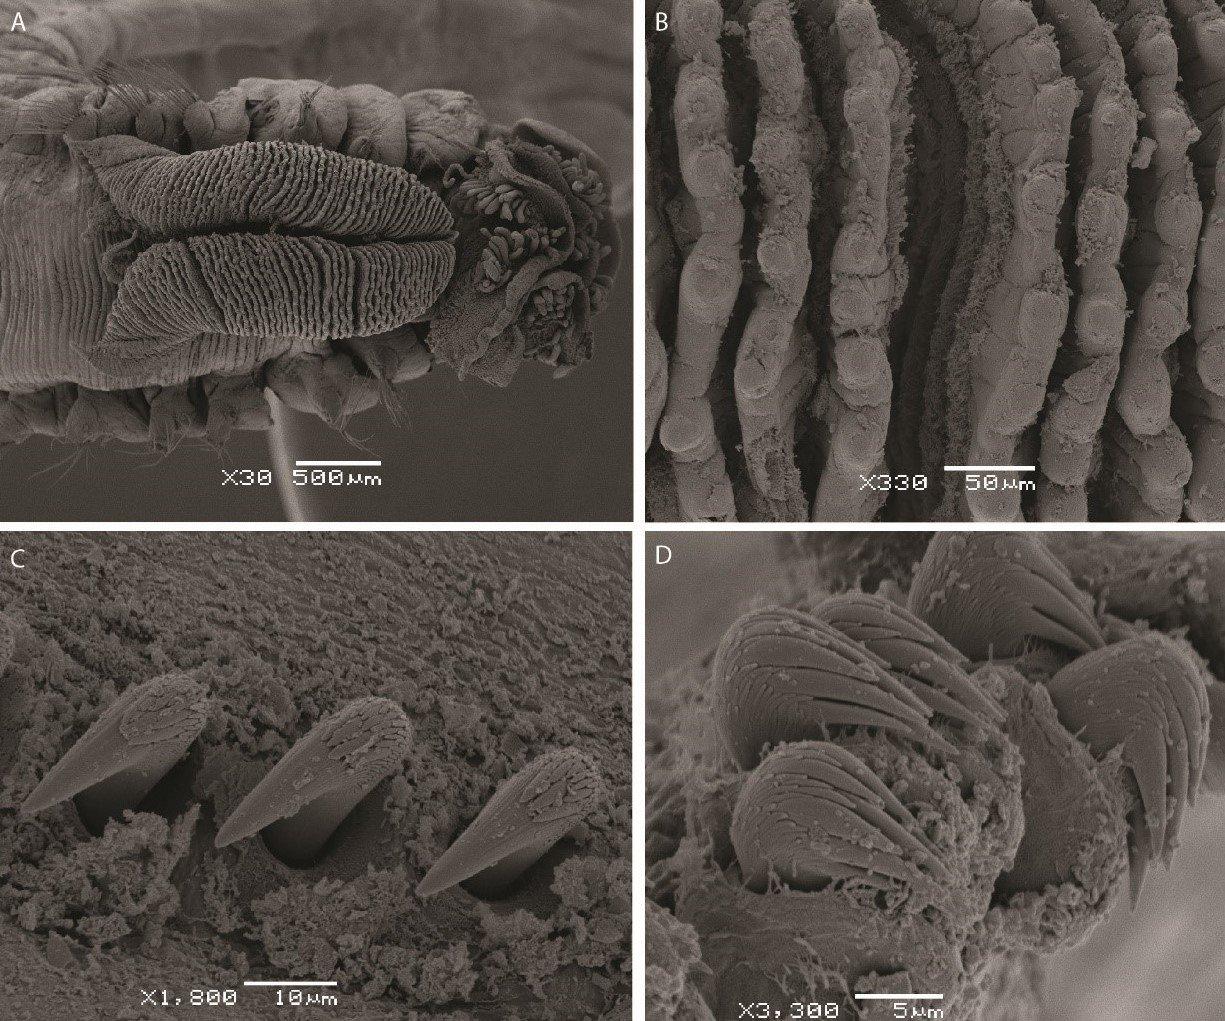 SEM images of Terebellides lilasae (Lavesque et al. 2019)